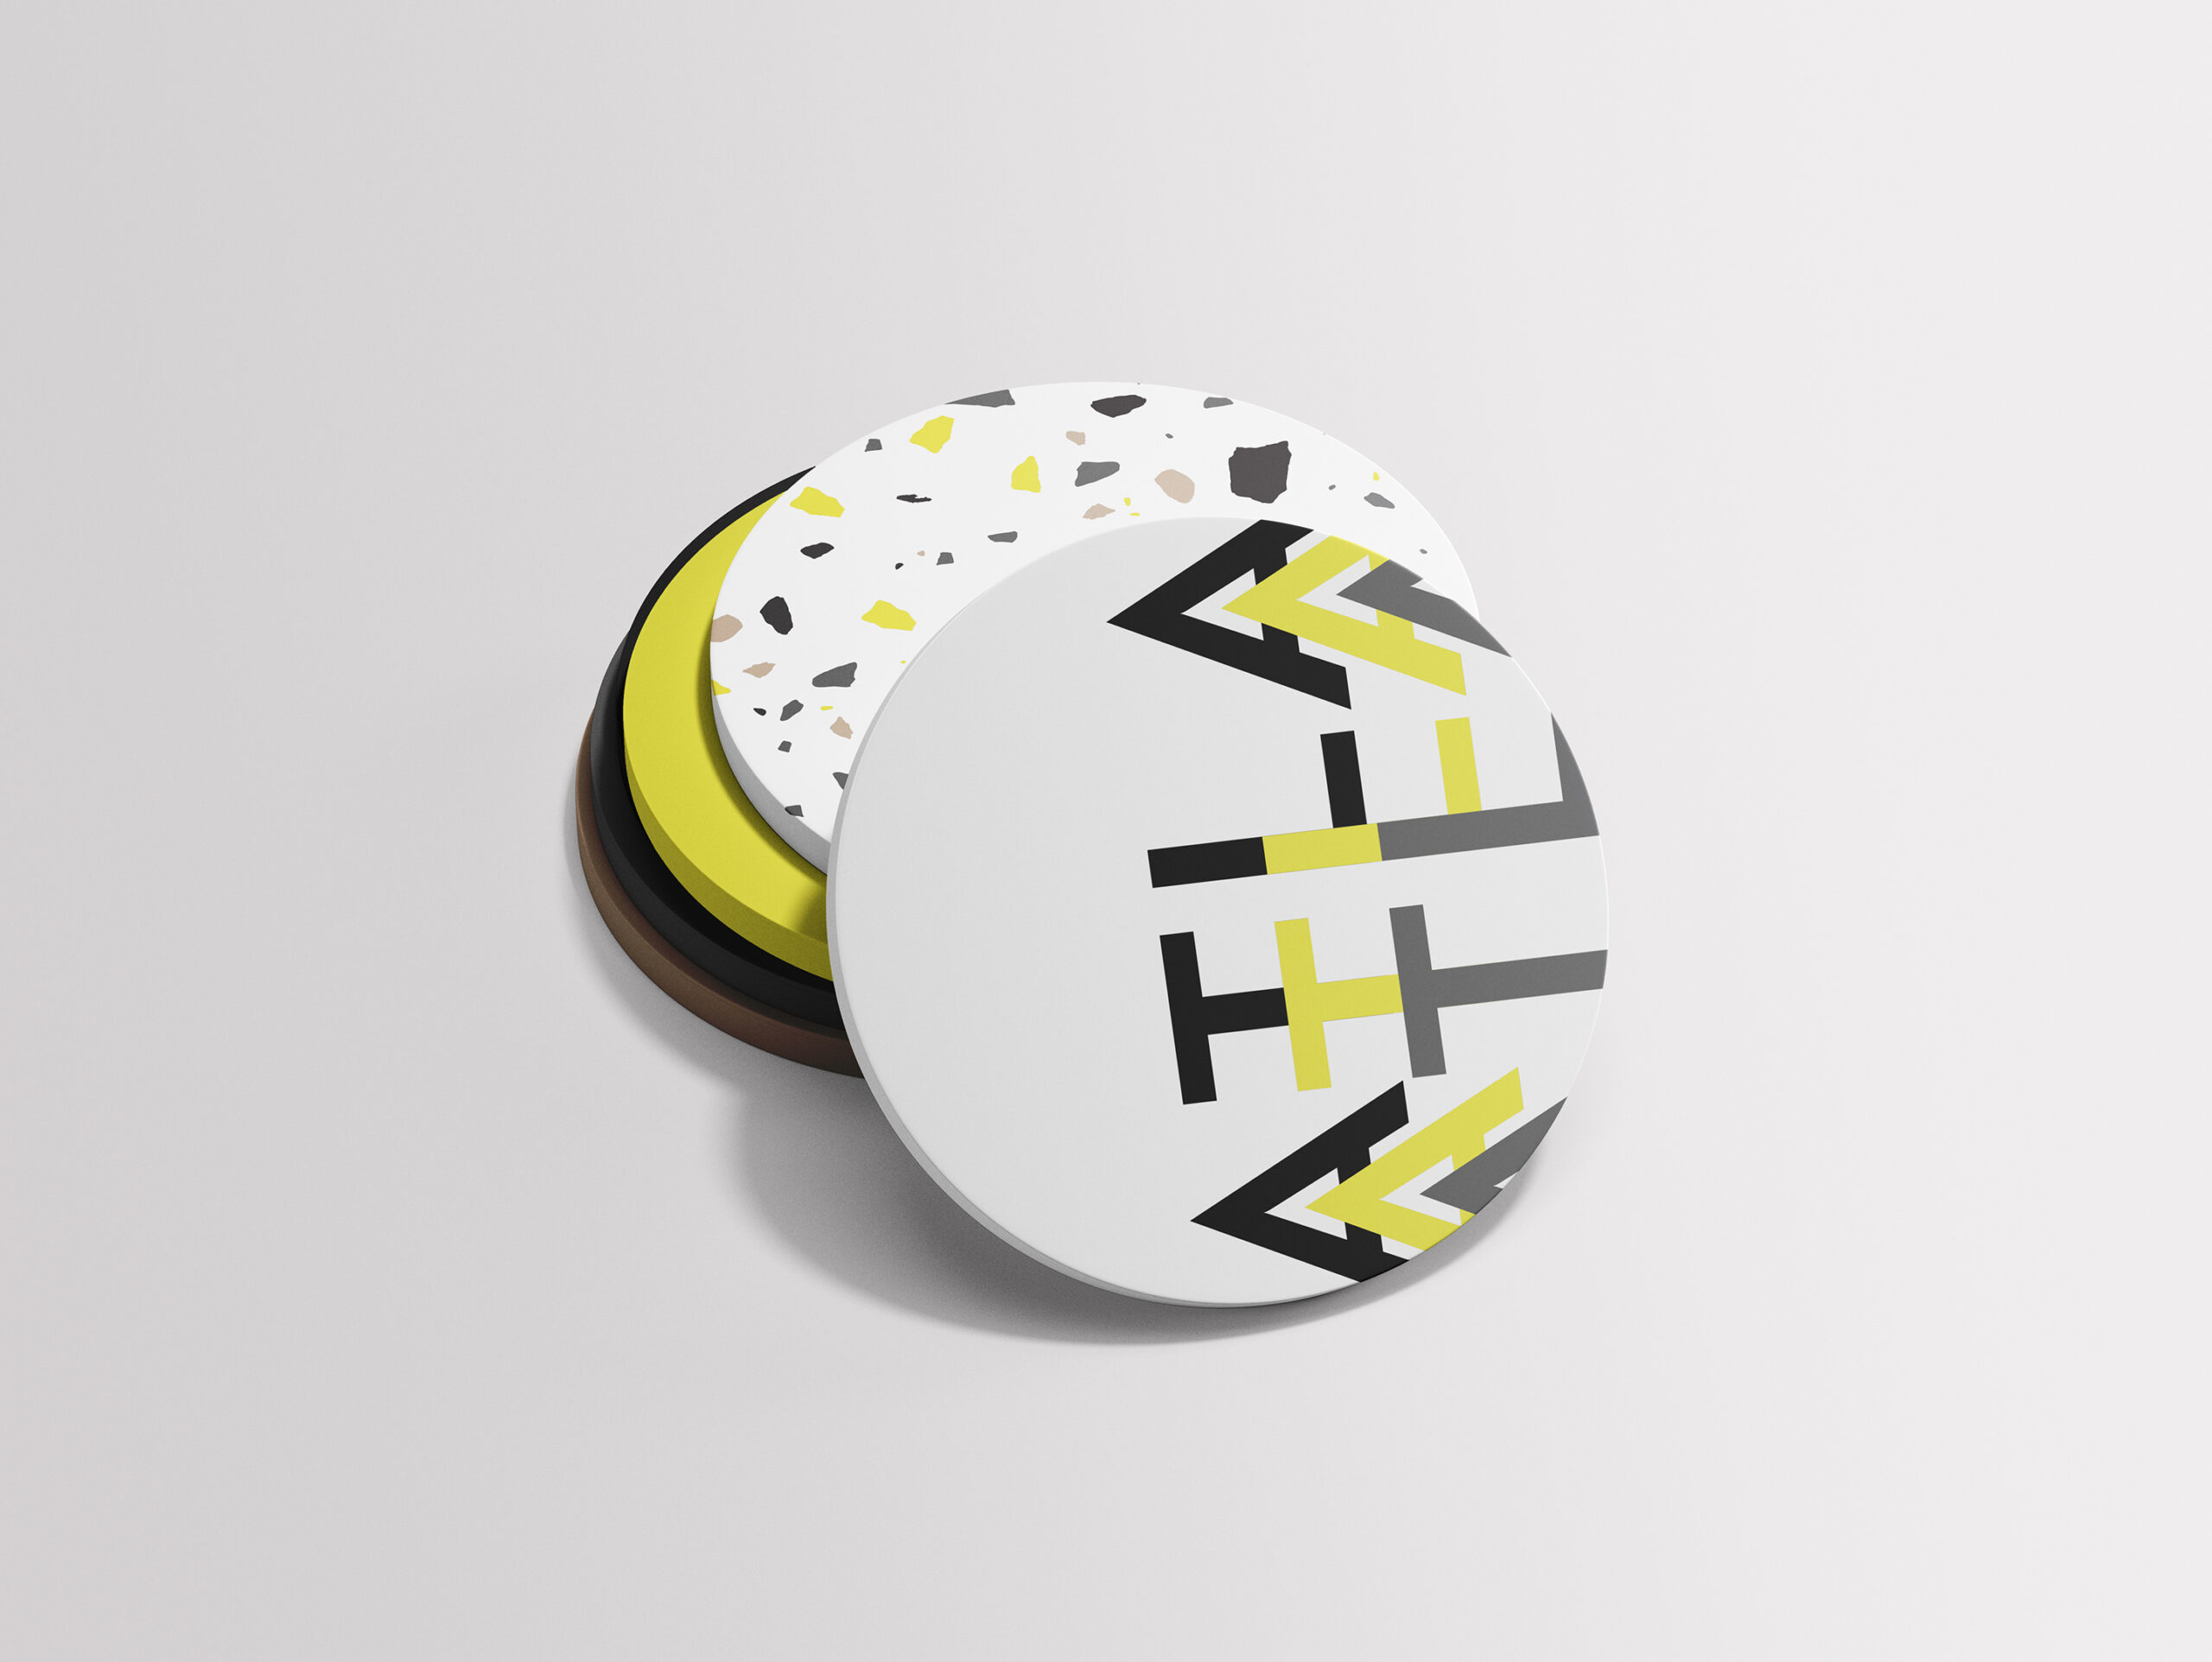 Atla_Coaster-mockup